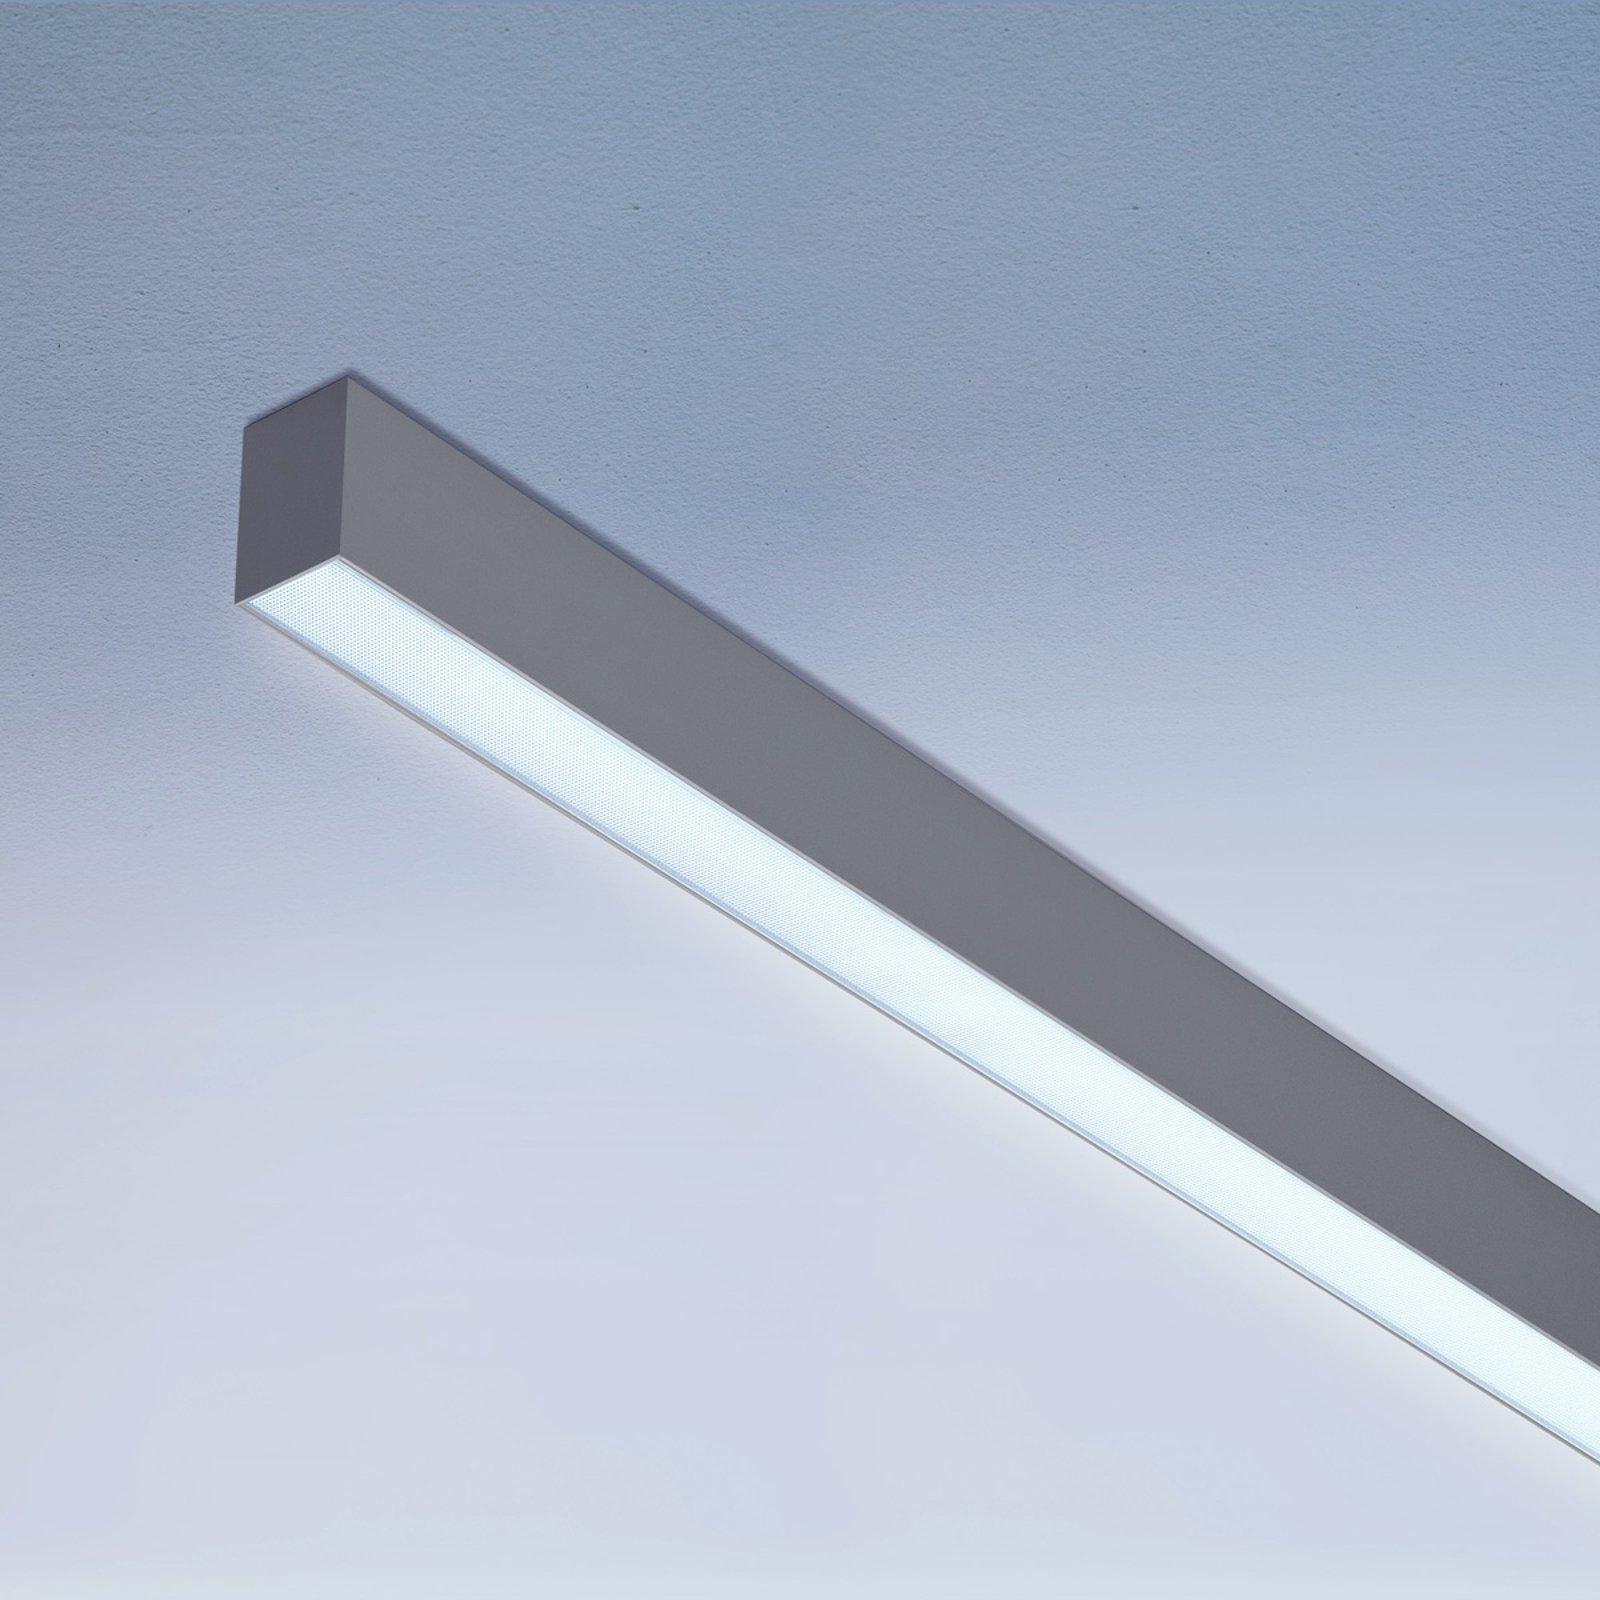 Medium Power Matric-A3 - LED-vegglampe 118,2 cm